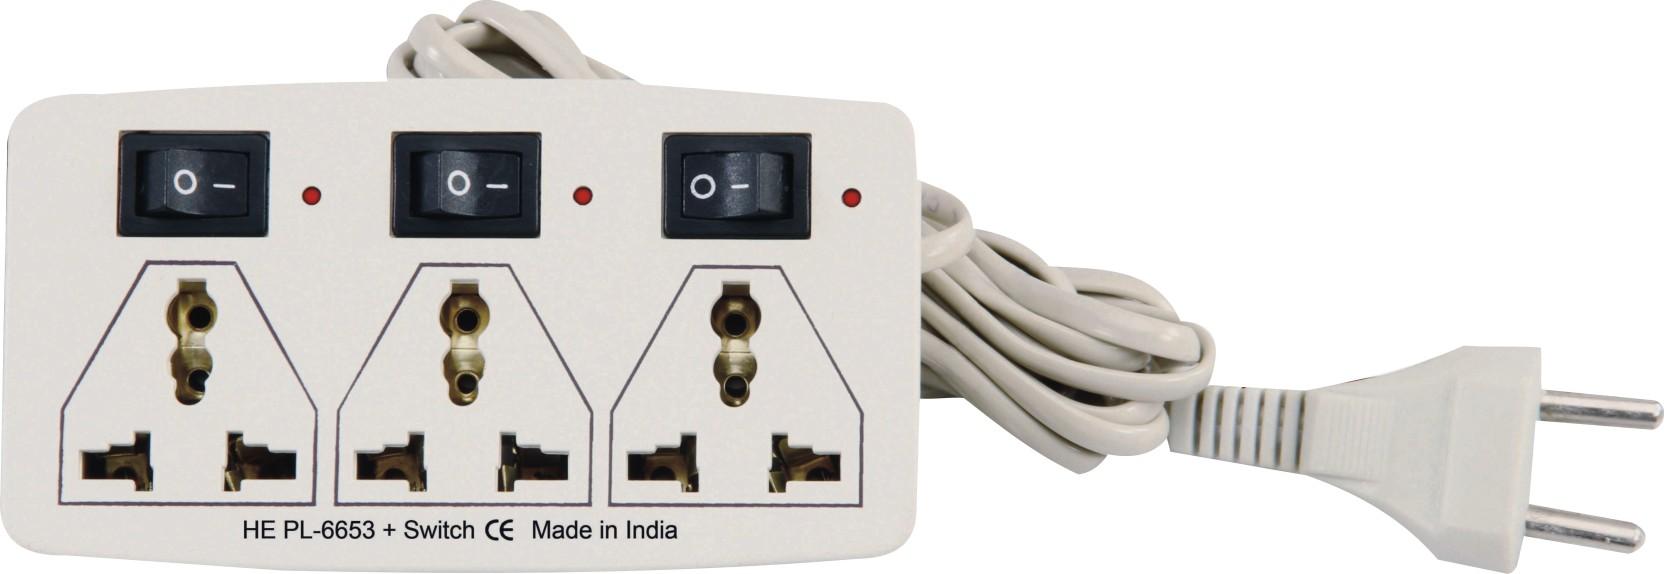 Sblaze Good Quality He Pl 6653 Mini Strip Power Extension Wiring Cord To Switch Add Cart